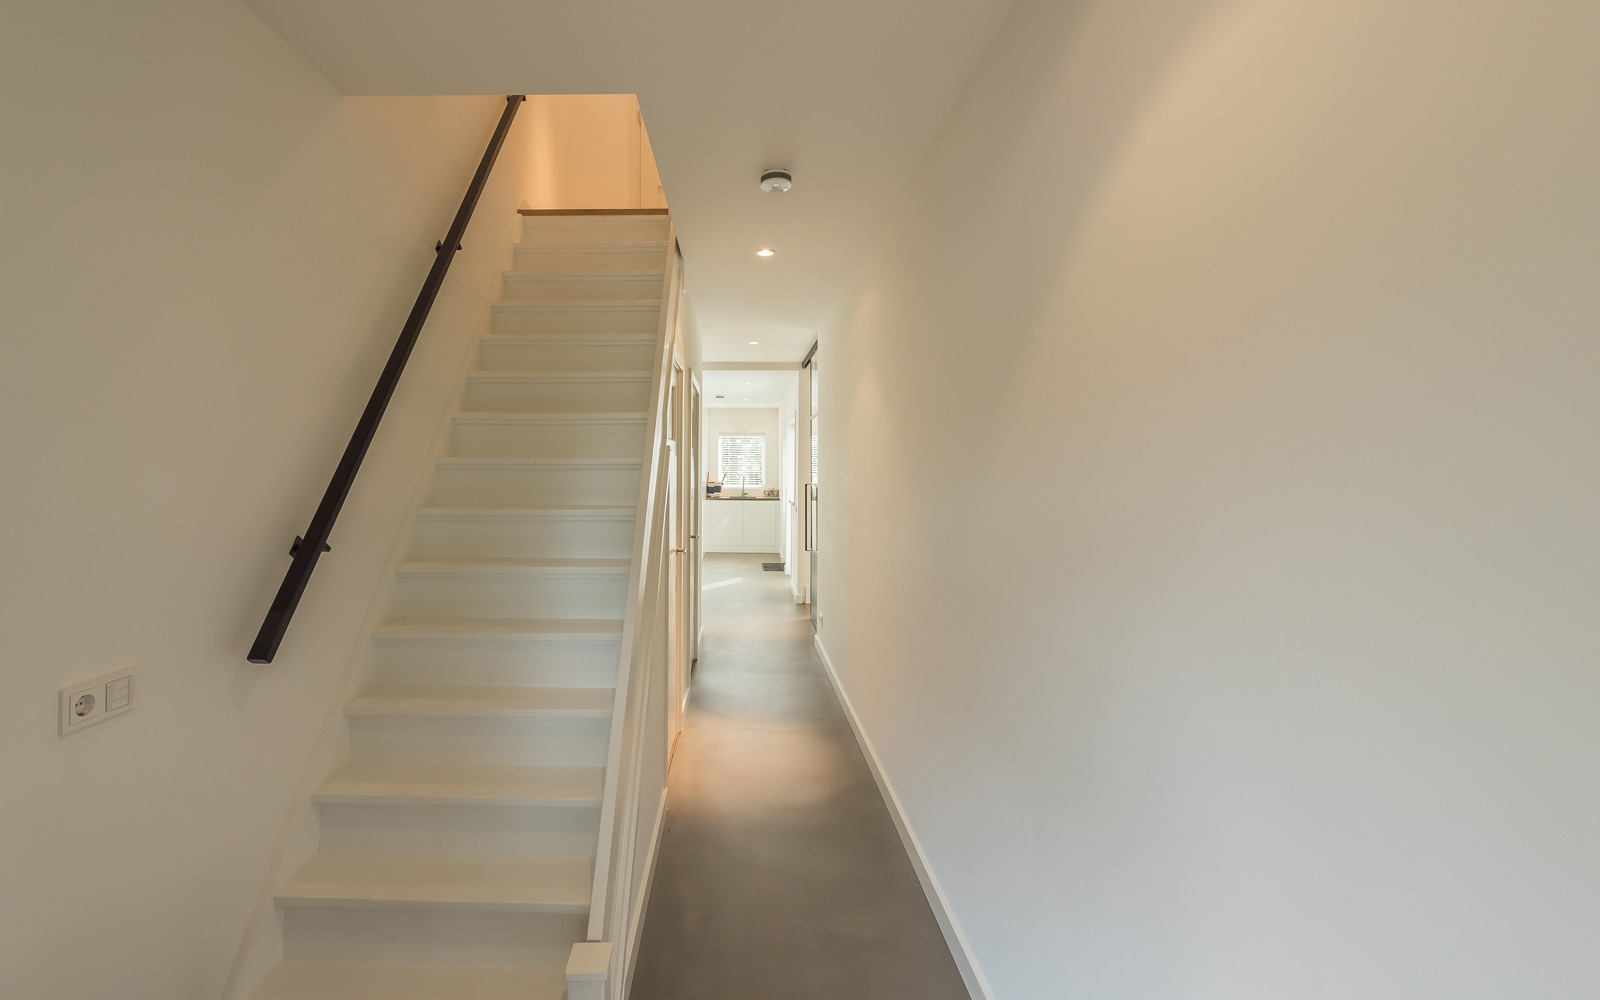 De trap naar de bovenverdieping